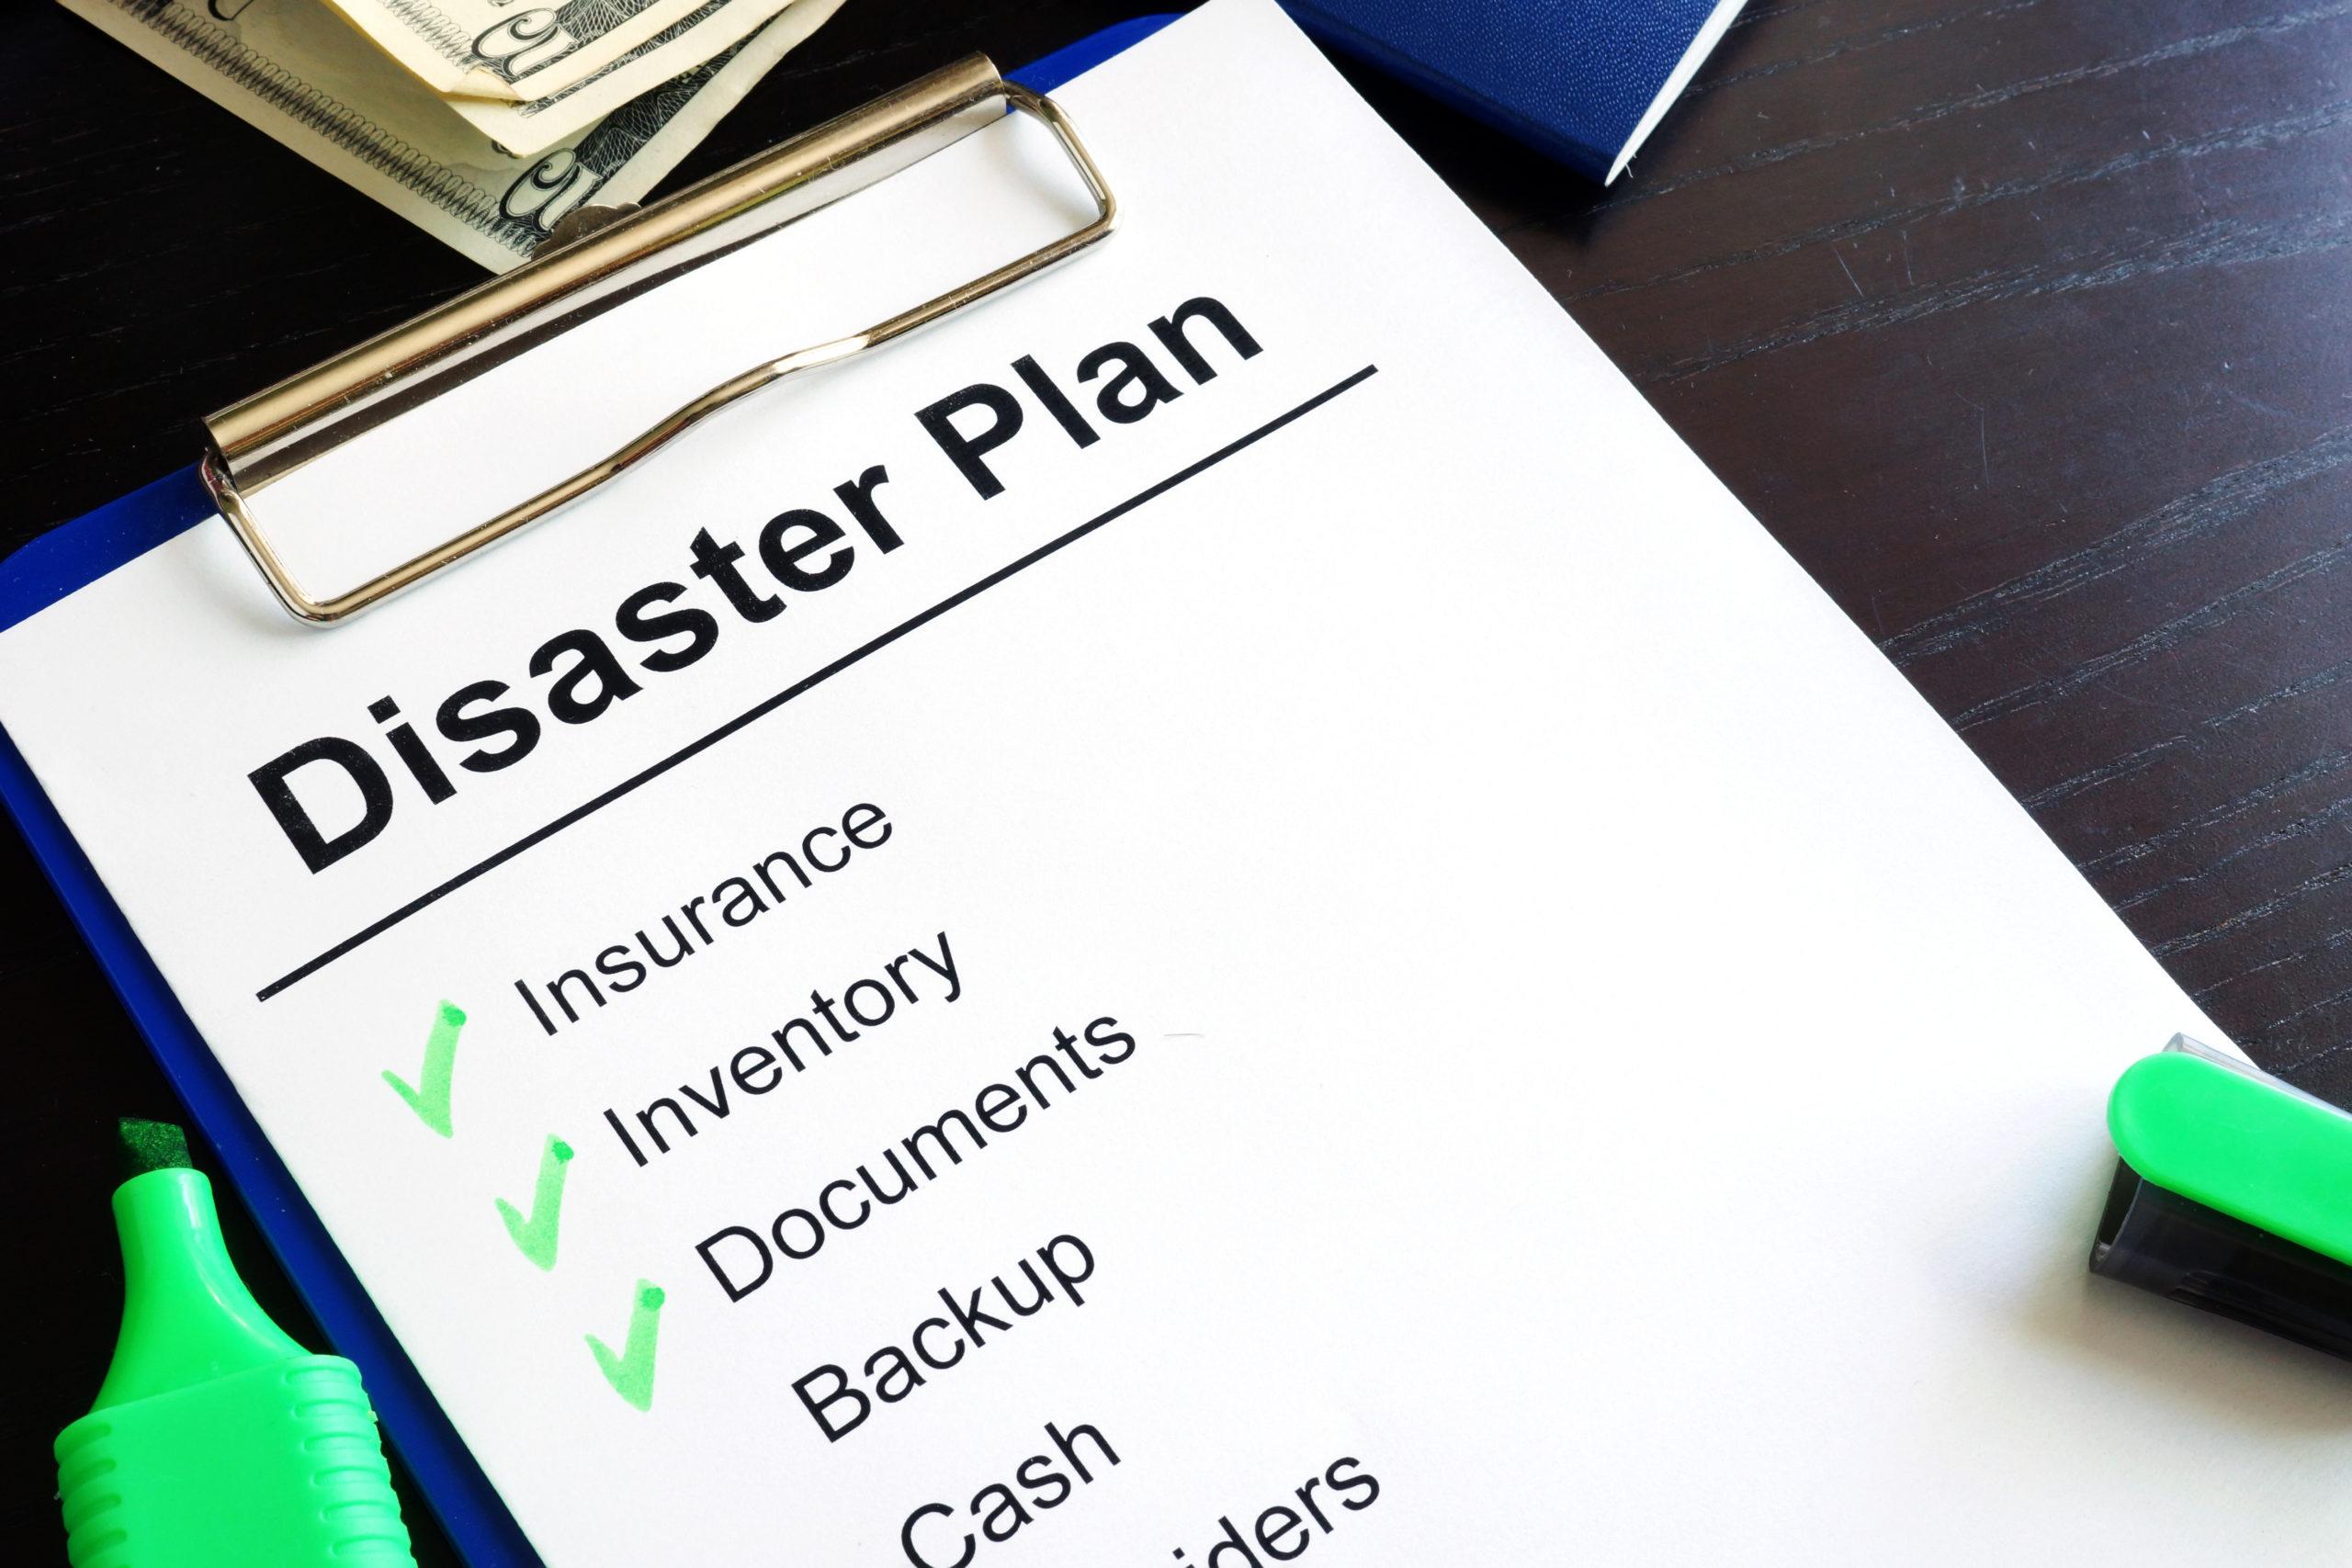 Disaster Plan Check List